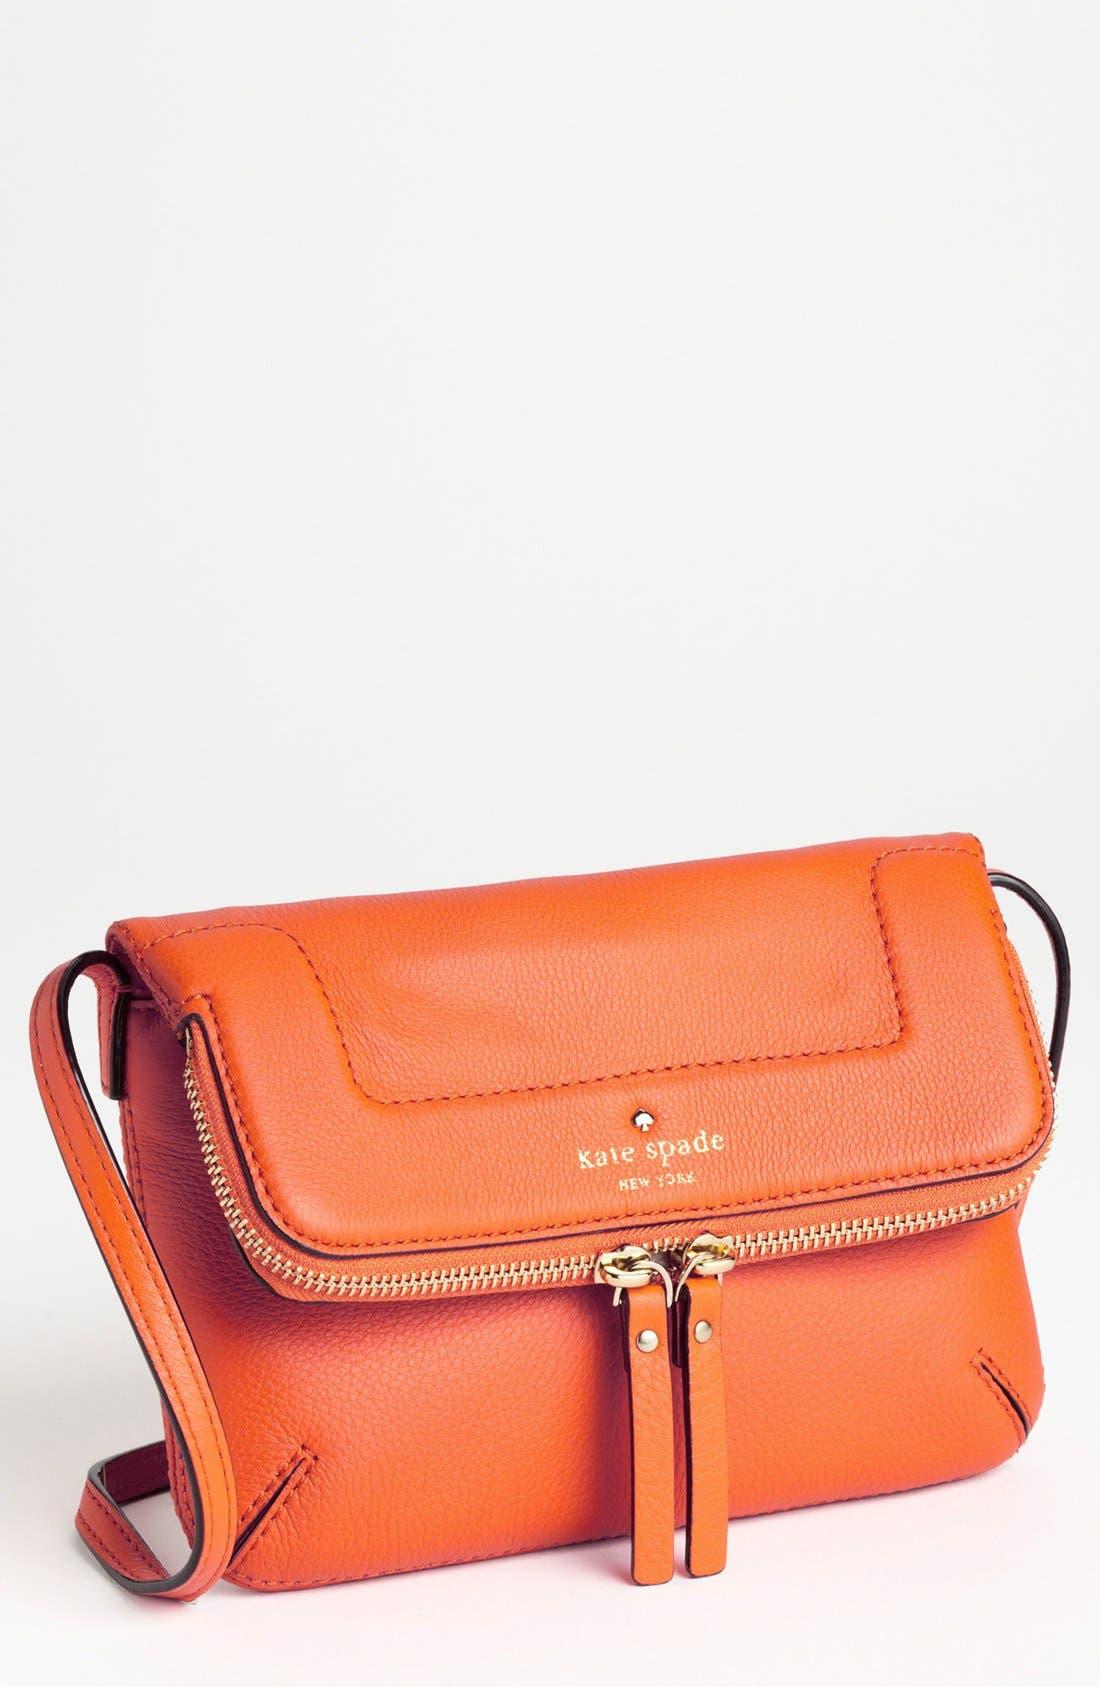 Main Image - kate spade new york 'mansfield - mariana' crossbody bag (Special Purchase)